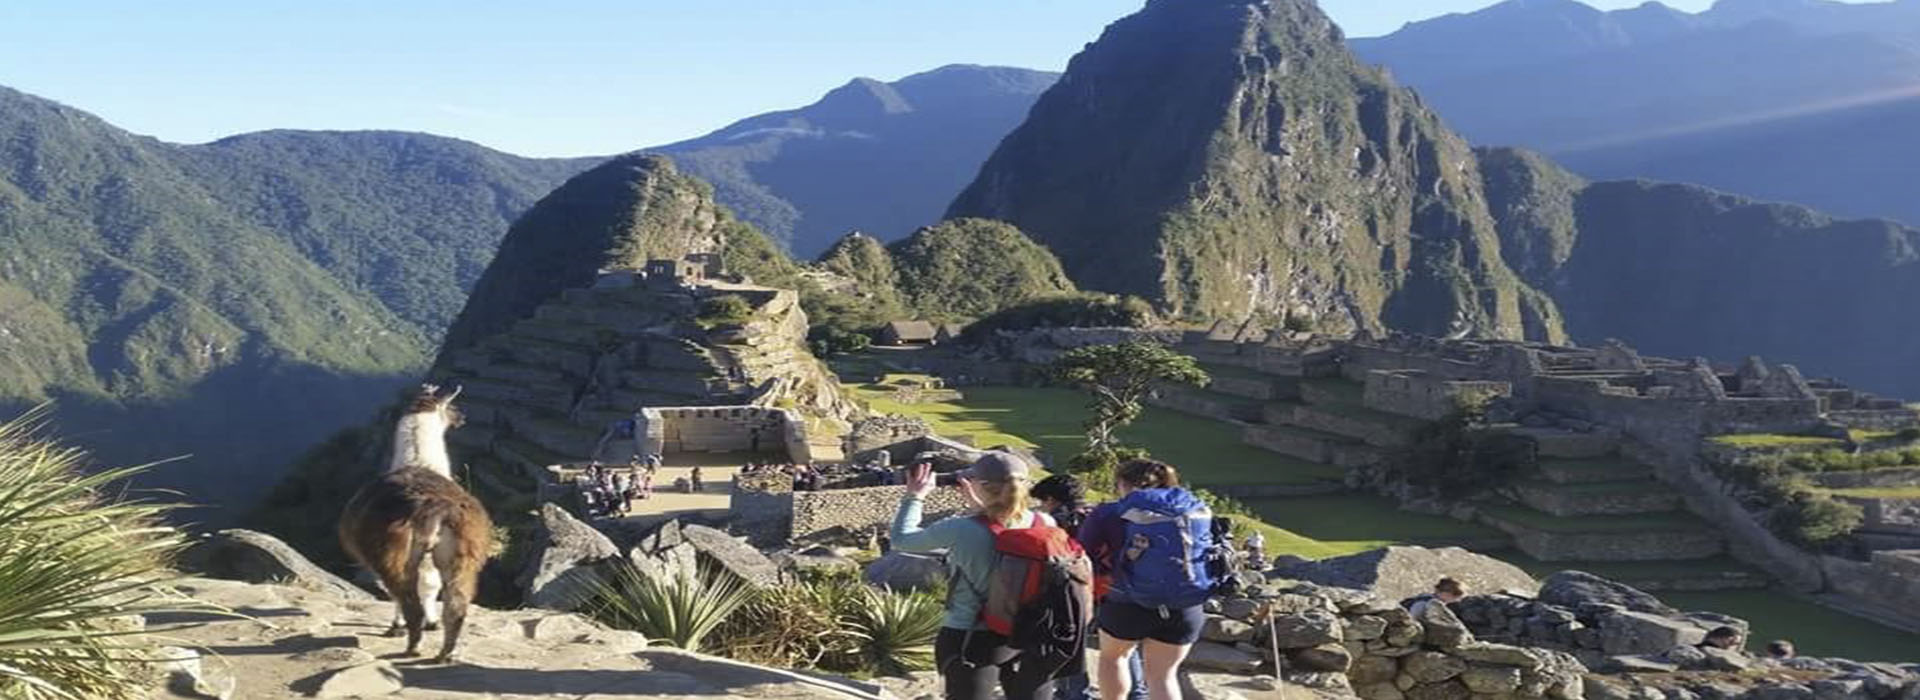 Inka Jungle Trek to Machu Picchu 3 days return by bus last day